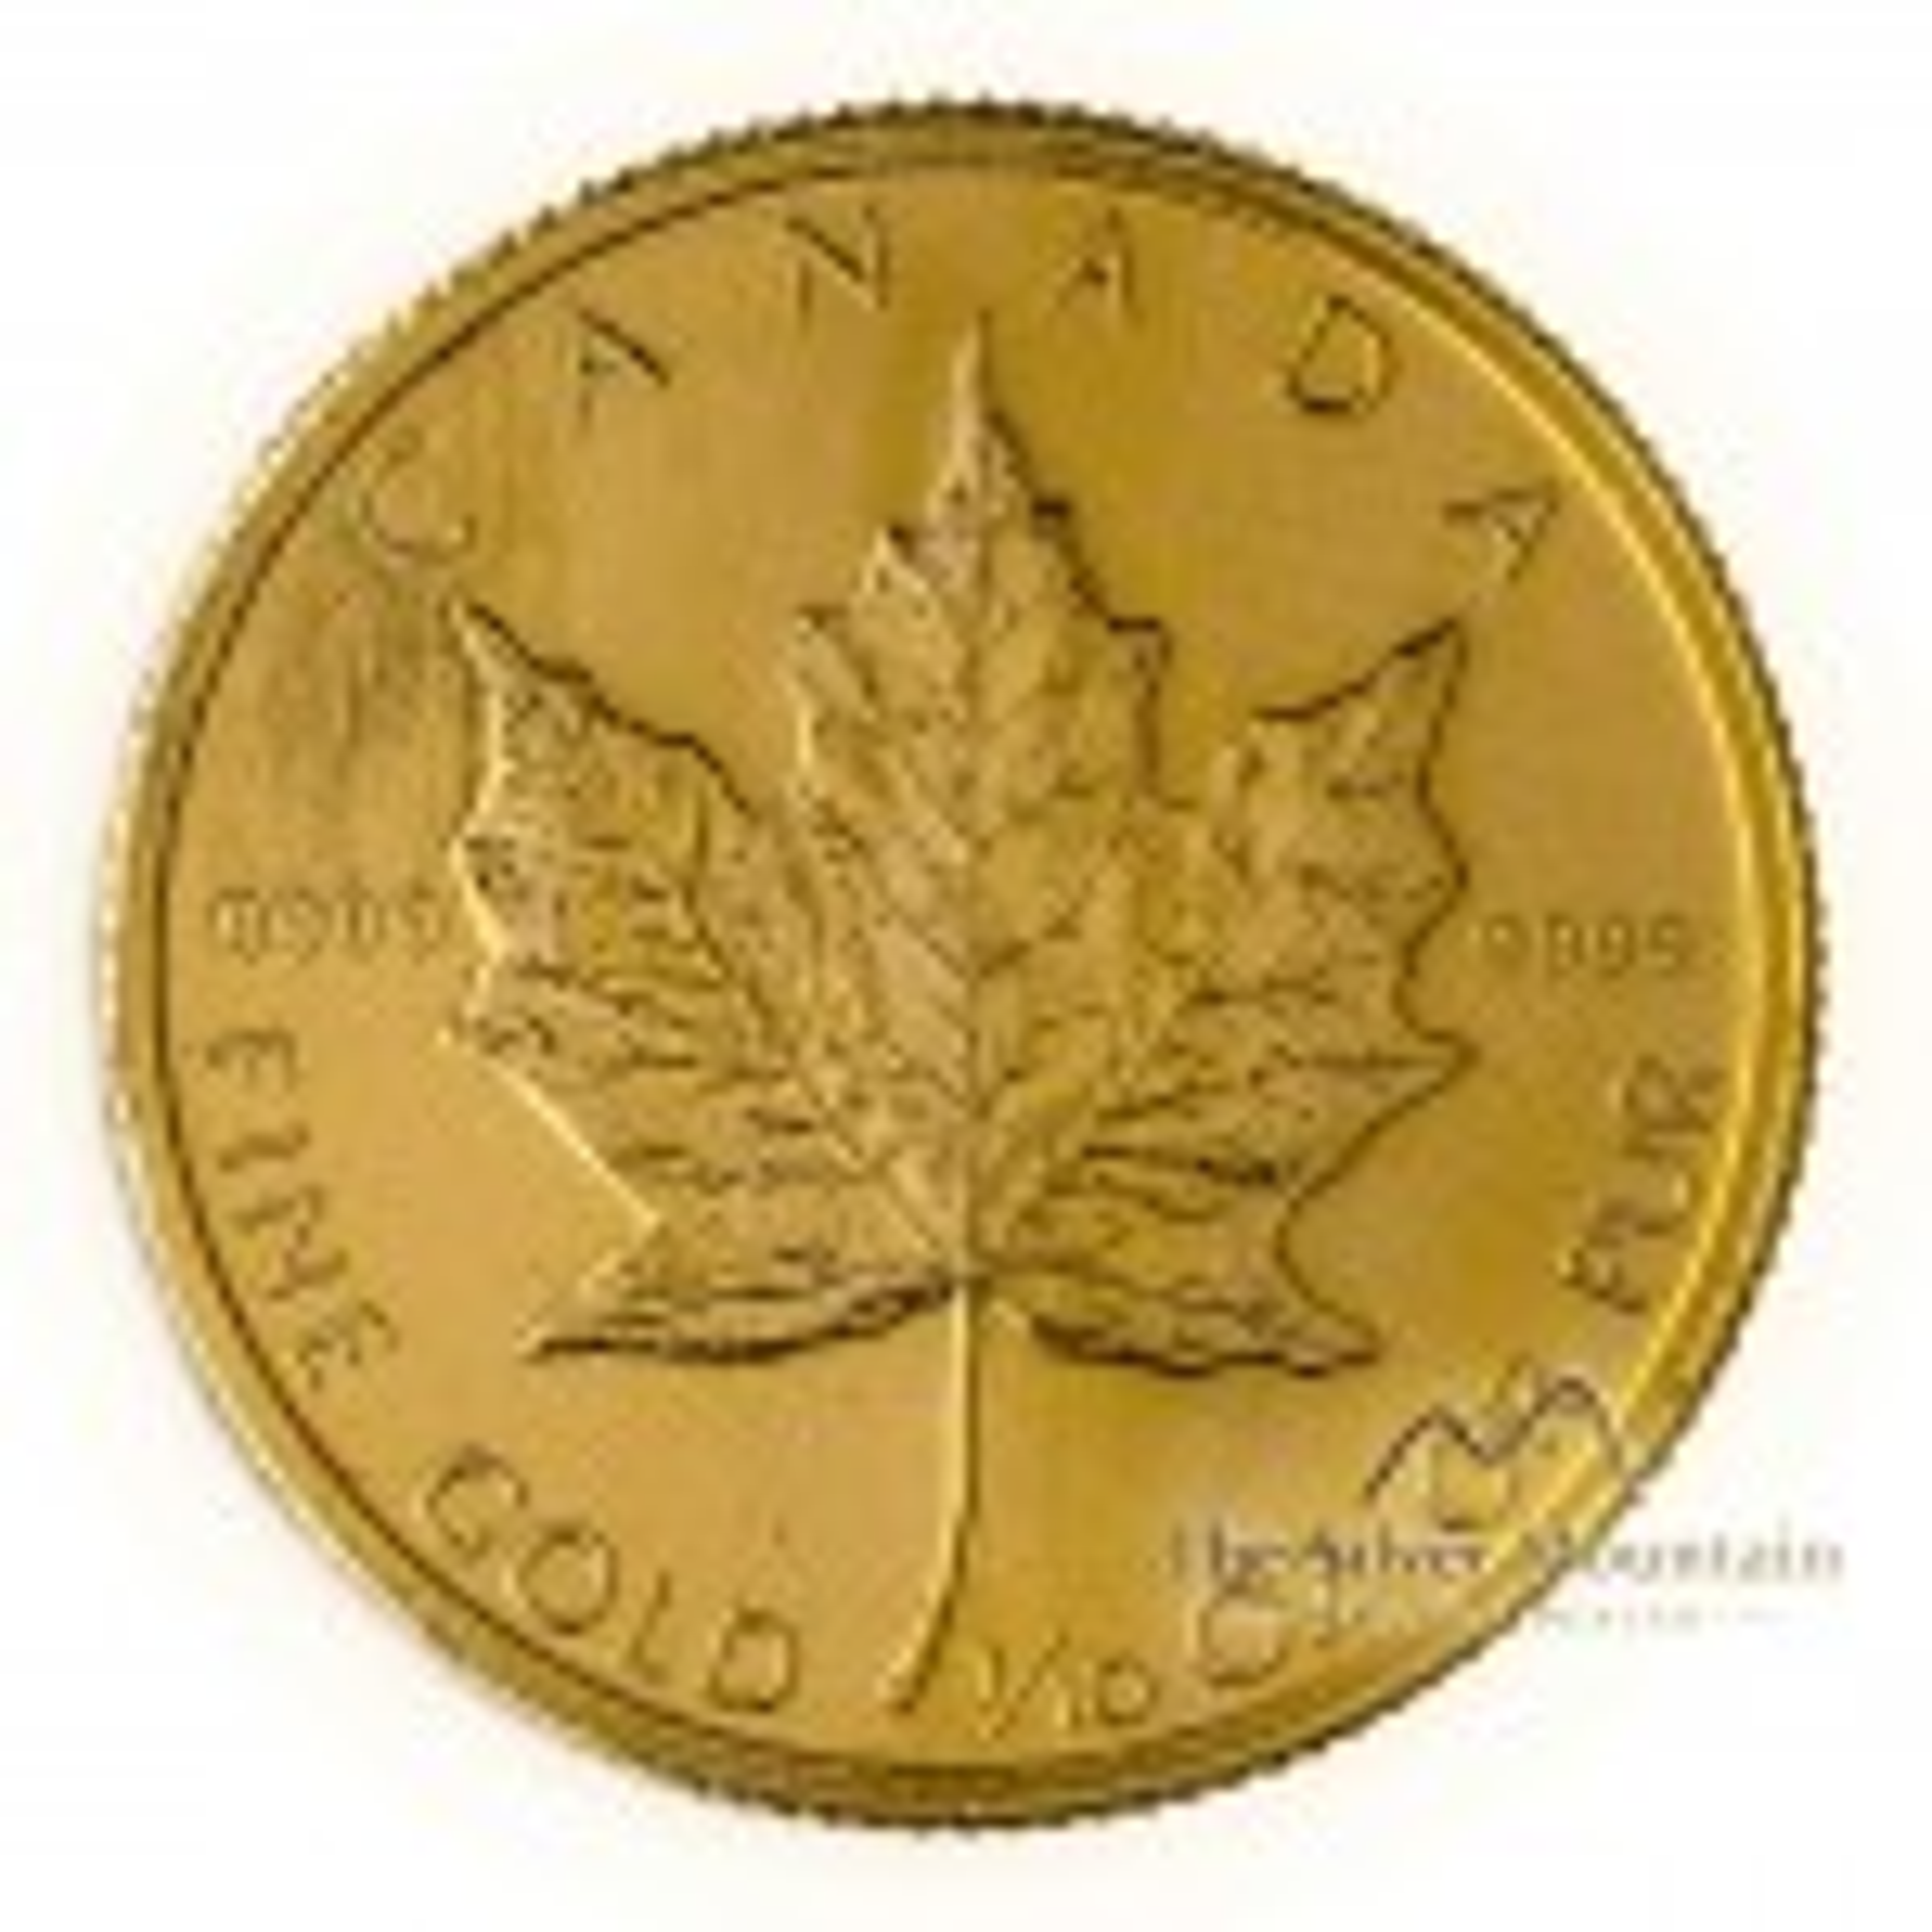 Gouden 1/10 troy ounce Maple Leaf munt